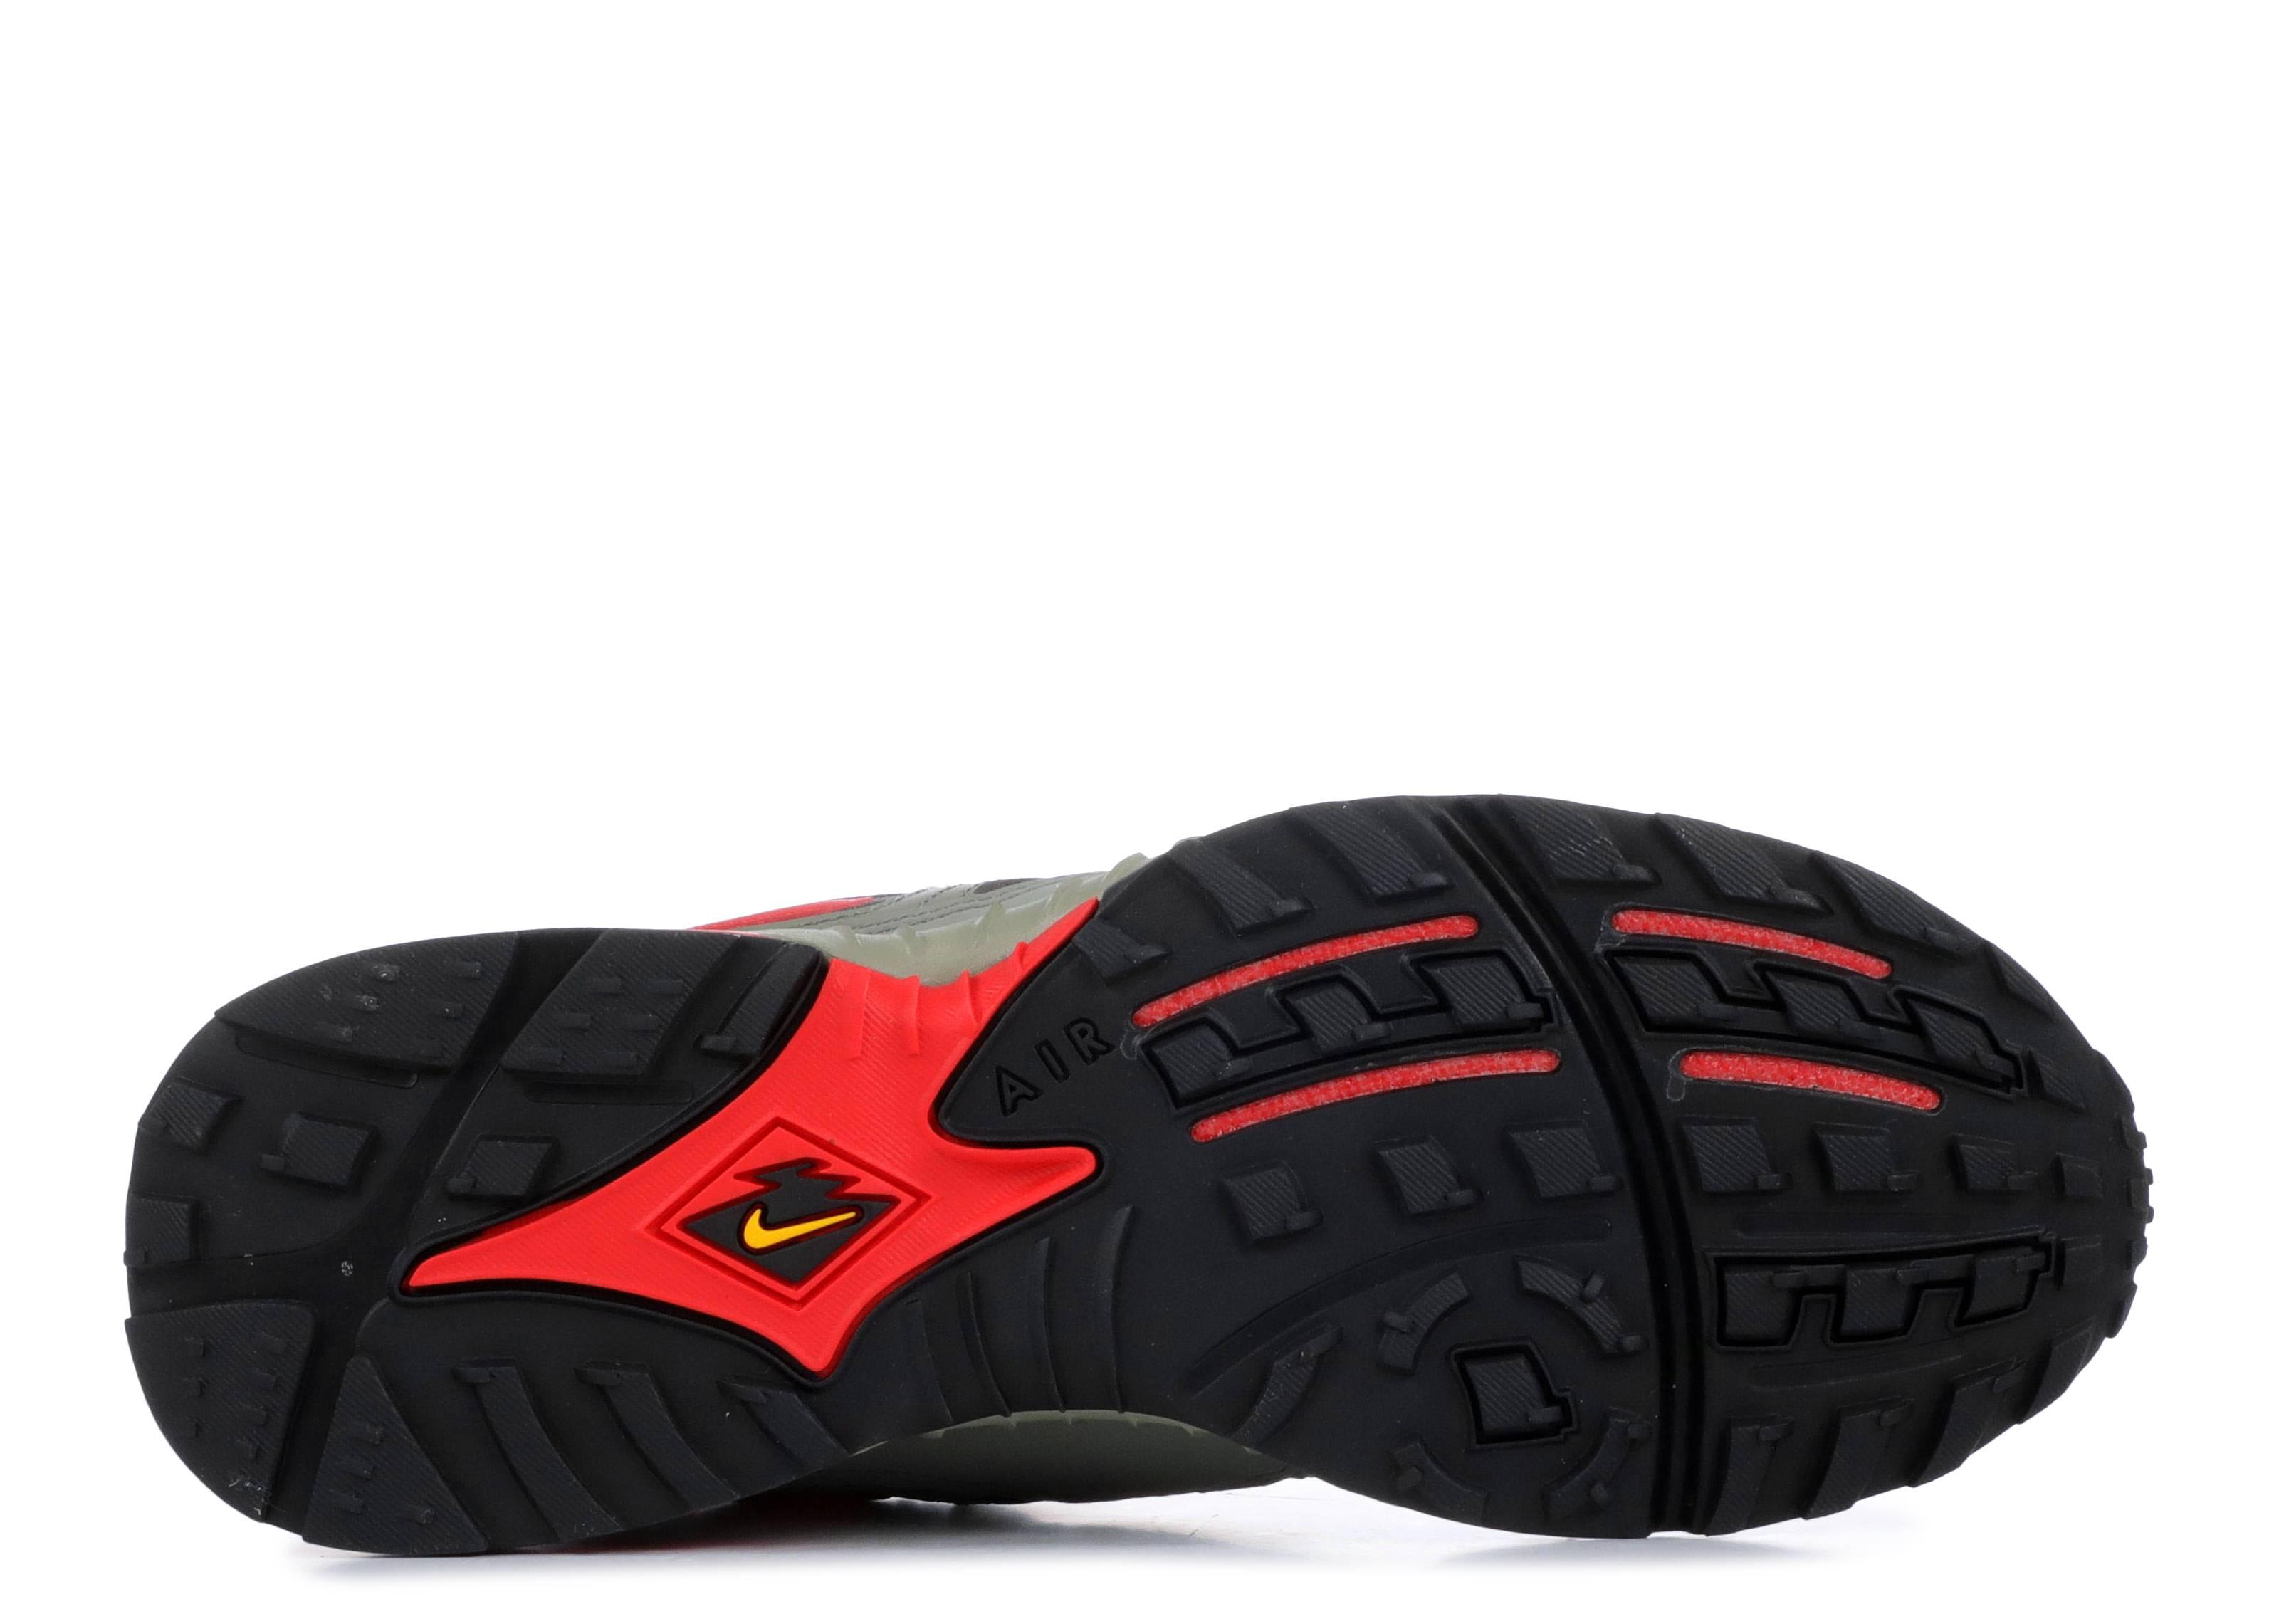 Air Terra Humara  18 - Nike - ao1545 002 - black habanero-dark stucco  d04439e86